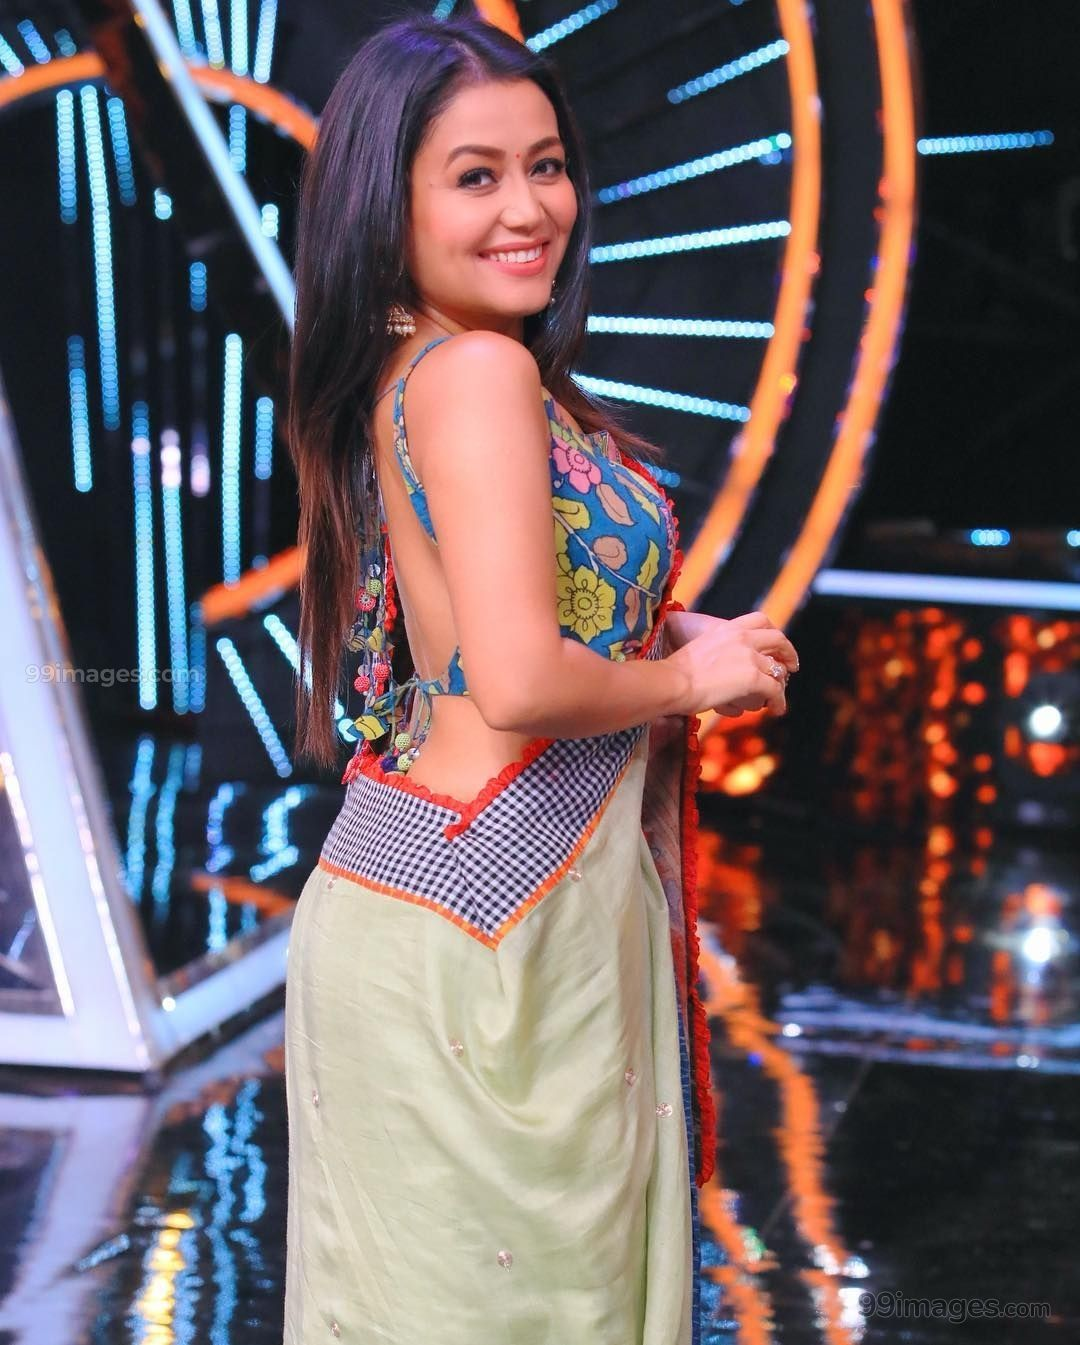 Neha Kakkar Beautiful Photos Mobile Wallpapers Hd Android Iphone 1080p 37833 Nehakakkar Actress T Neha Kakkar Dresses Celebrity Outfits Neha Kakkar